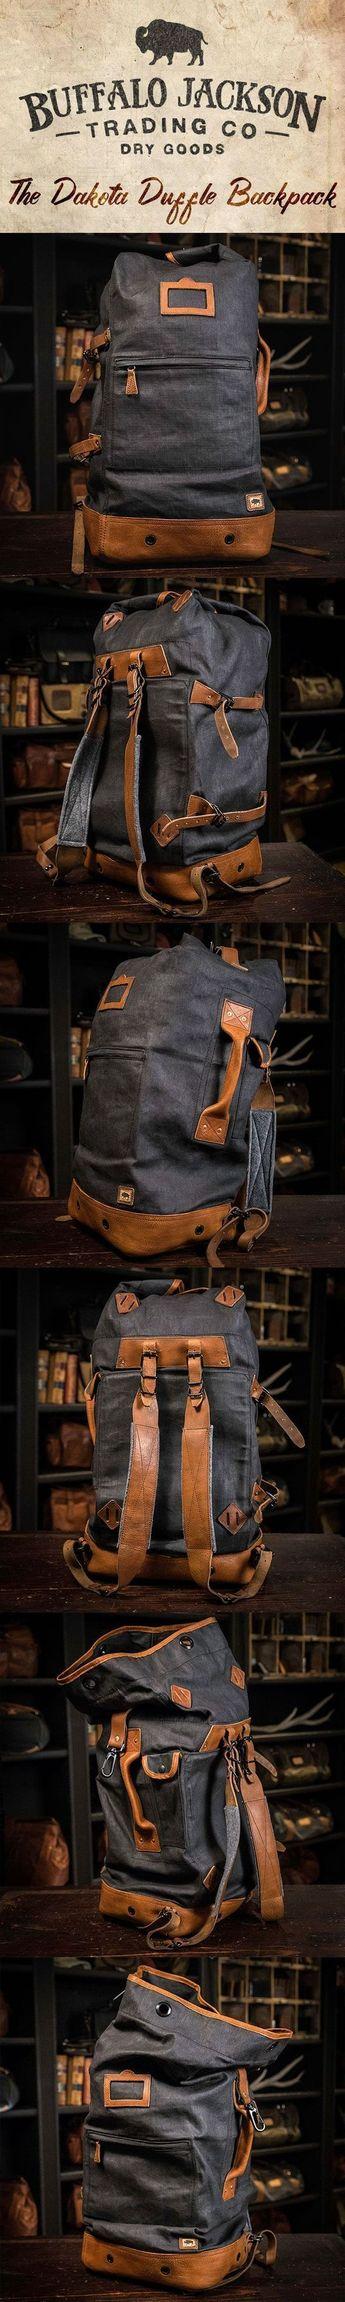 Dakota Waxed Canvas Military Sea Bag Backpack | Navy Charcoal w/ Saddle Tan Leather